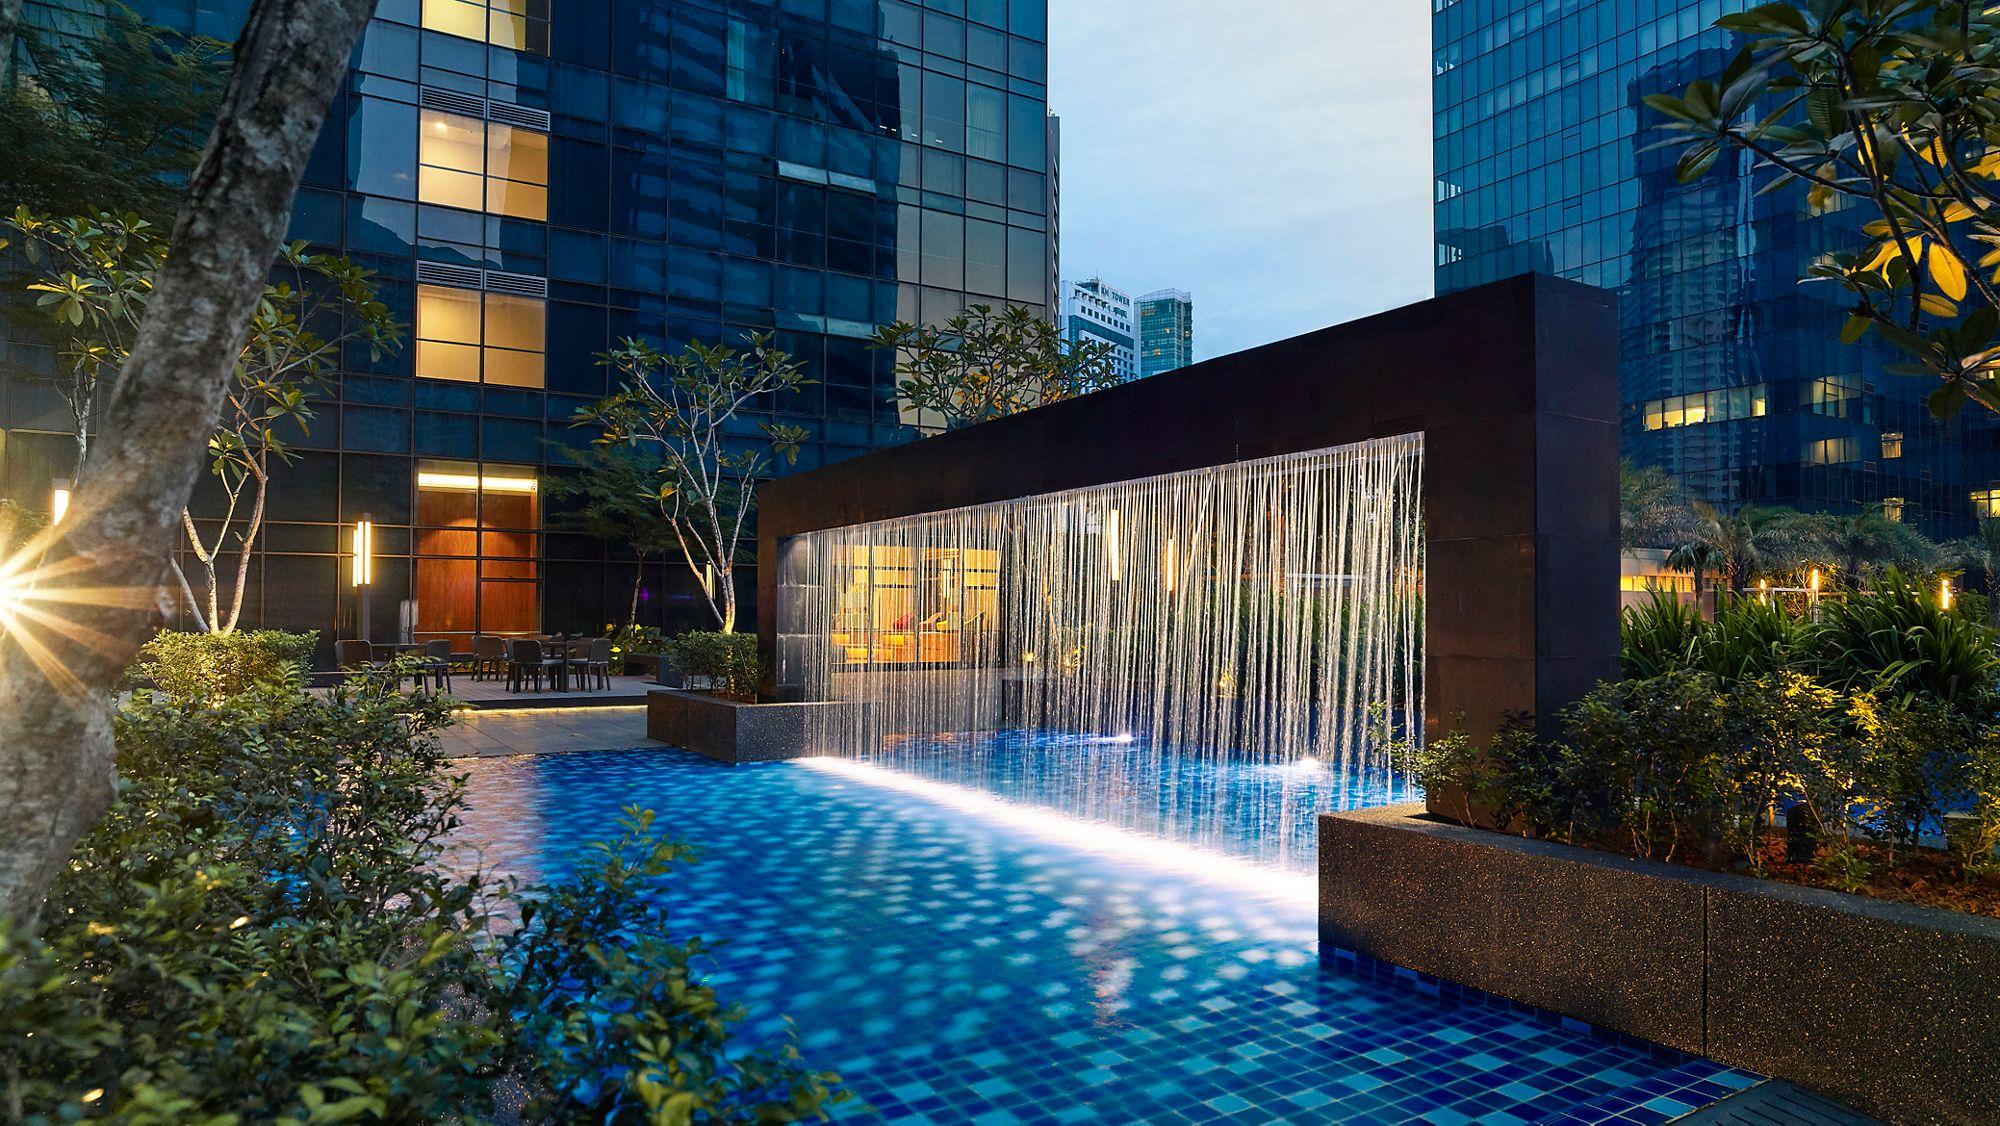 The Ritz-Carlton Residences, Kuala Lumpur, Jalan Sultan Ismail